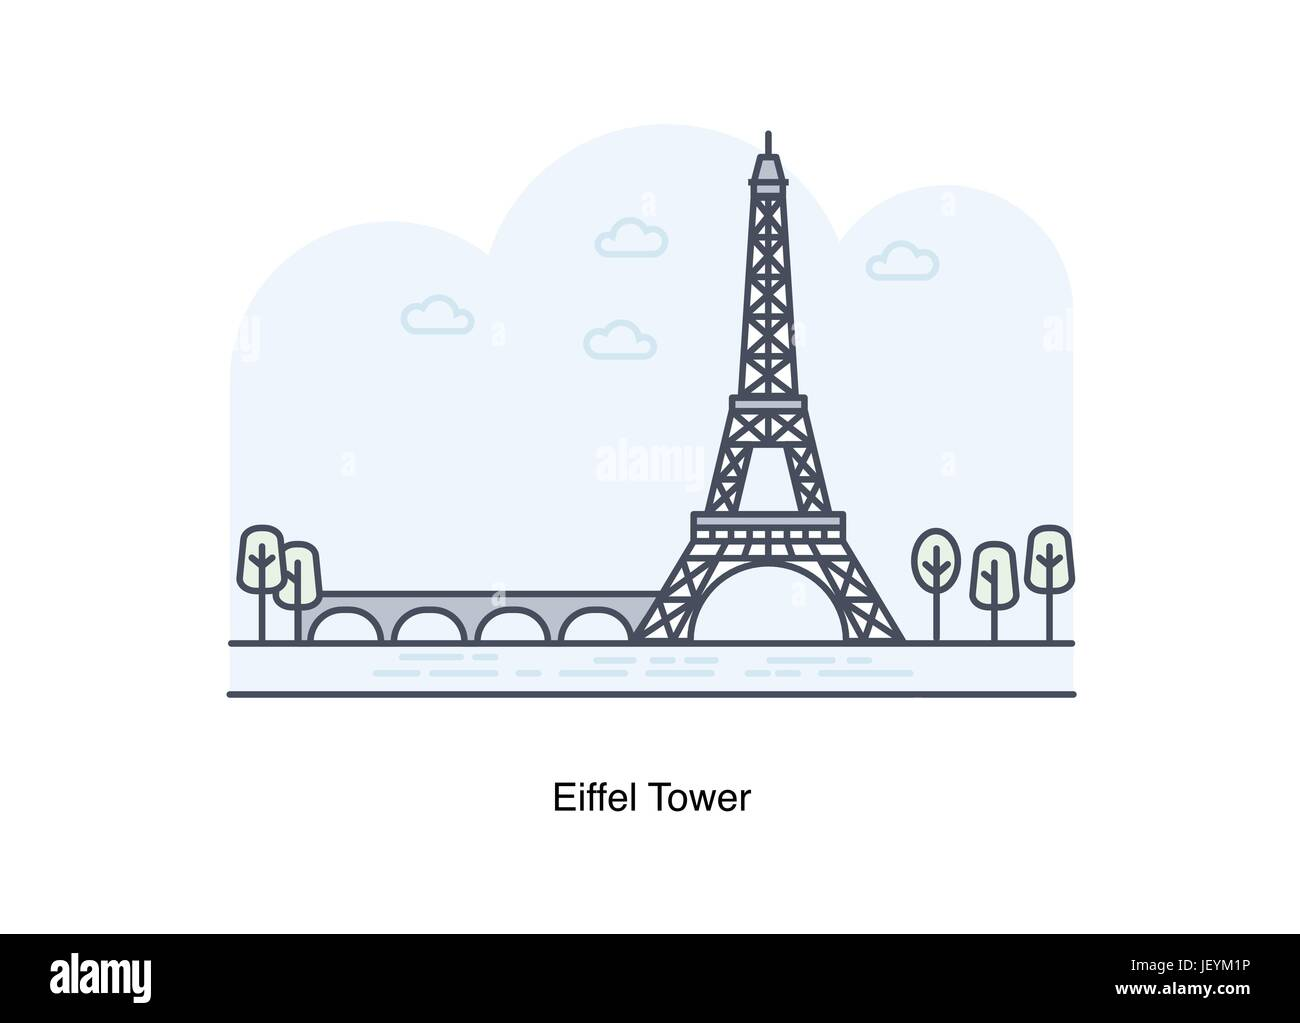 Vector line illustration of Eiffel Tower, Paris, France. - Stock Vector